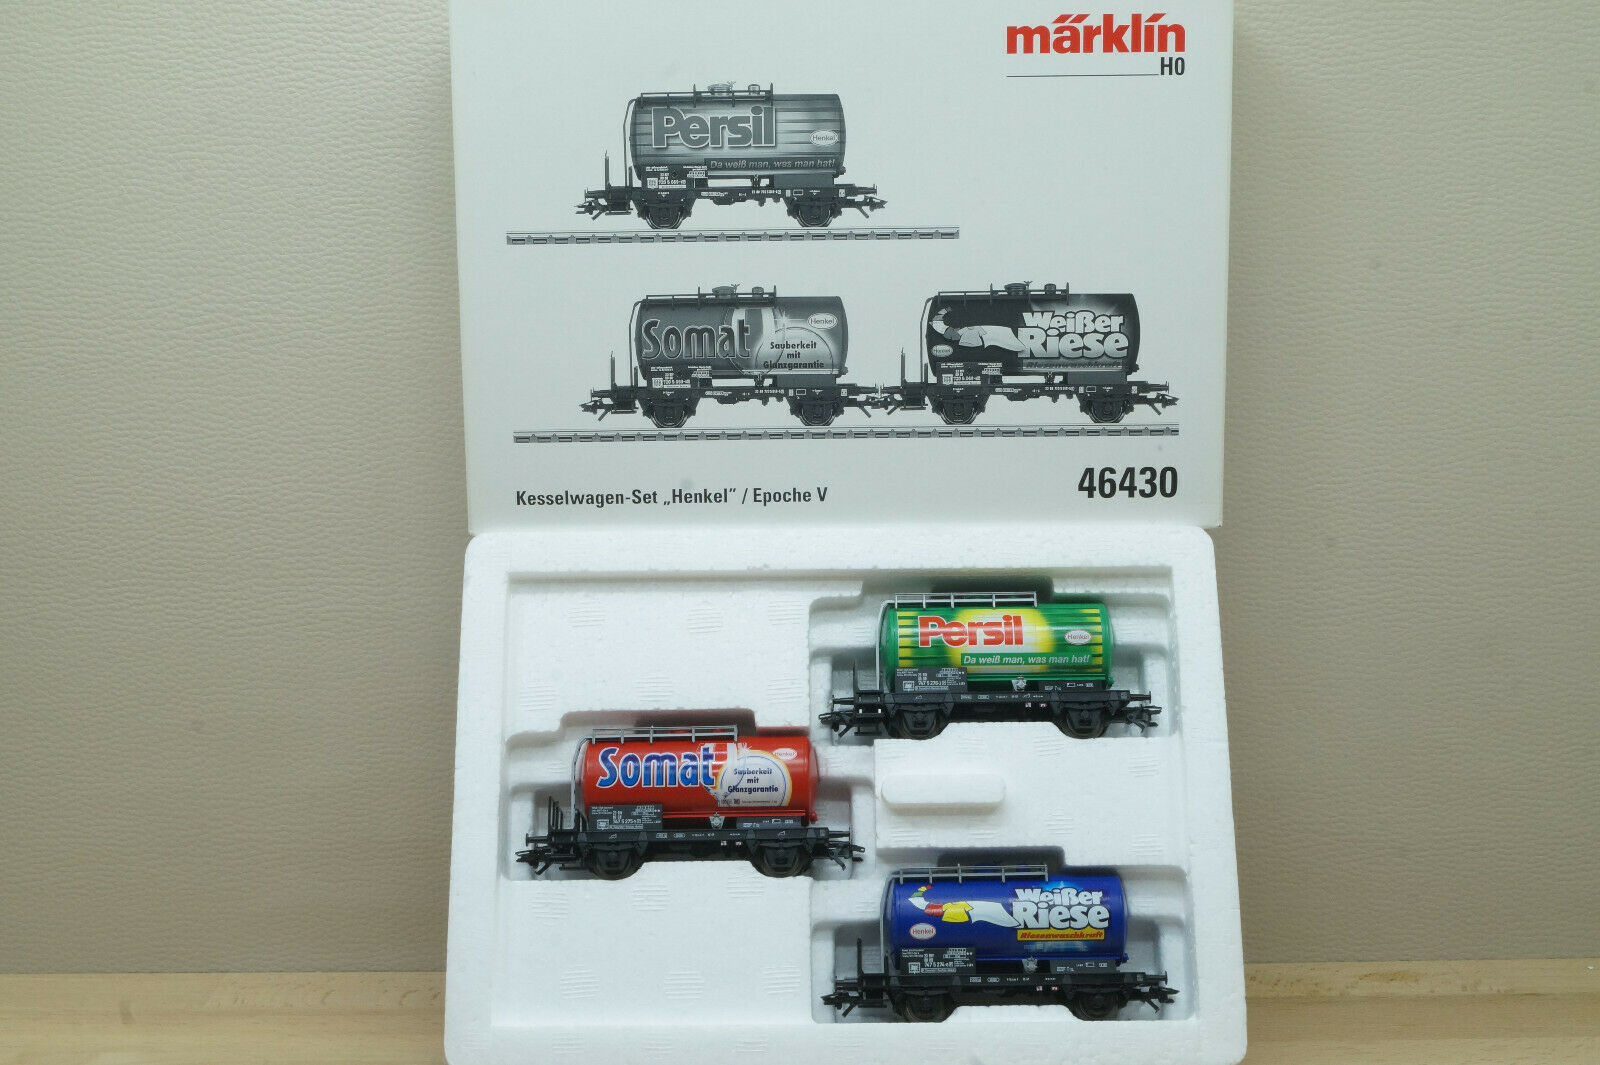 marklin 46430 Set di Vagoni Merci 3 Cisterna  Henkel  Persil,Somat Bianco